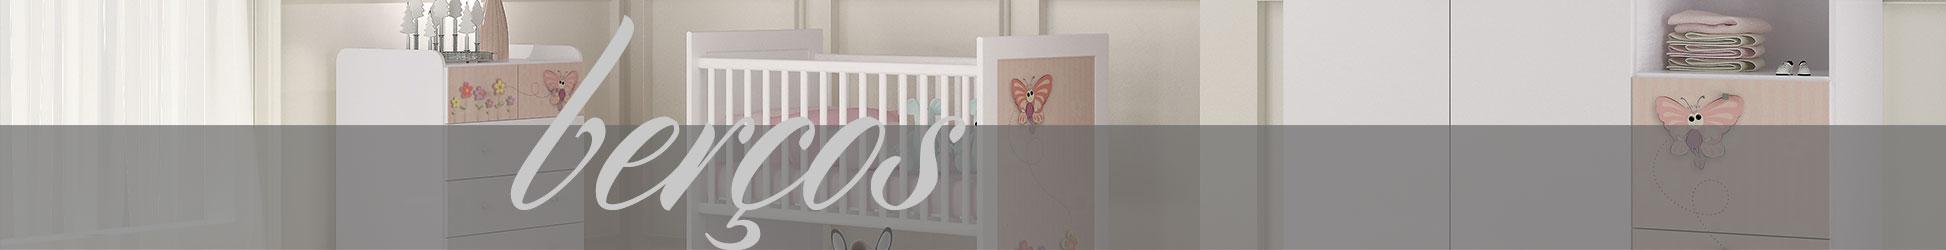 Móveis para bebê - berço